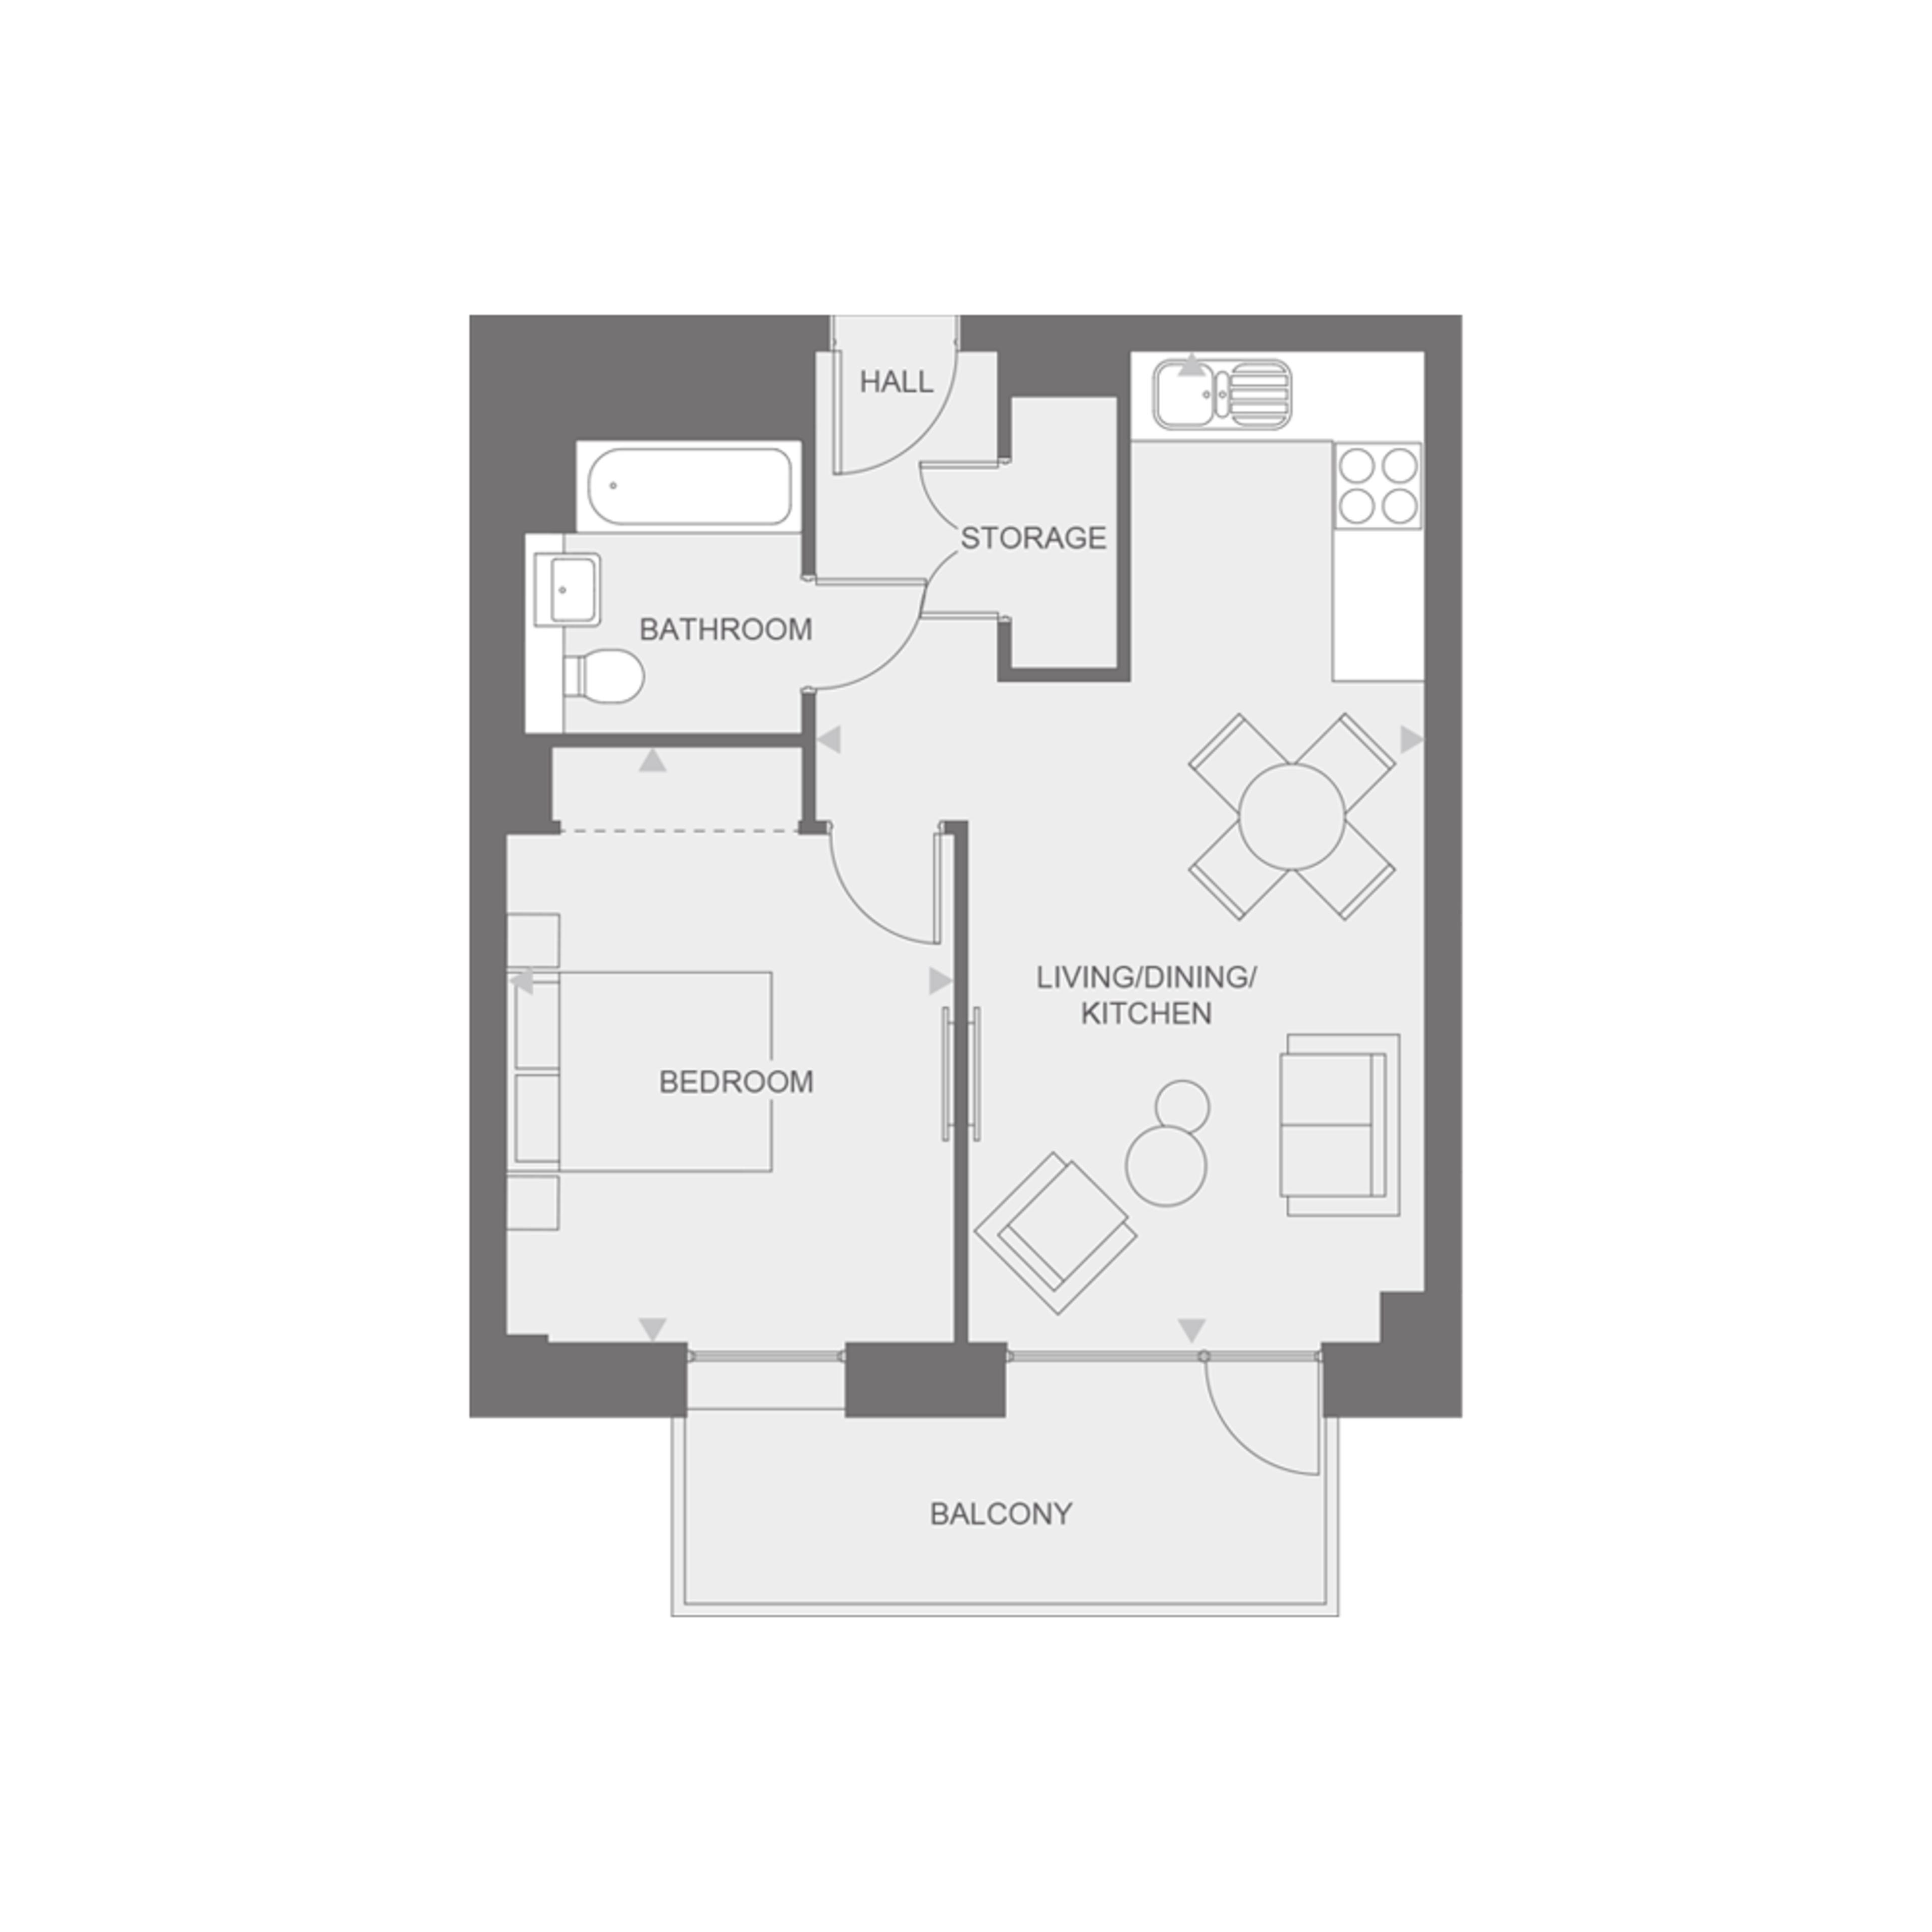 Anthology Wembley Parade - one bedroom - type H floor plan